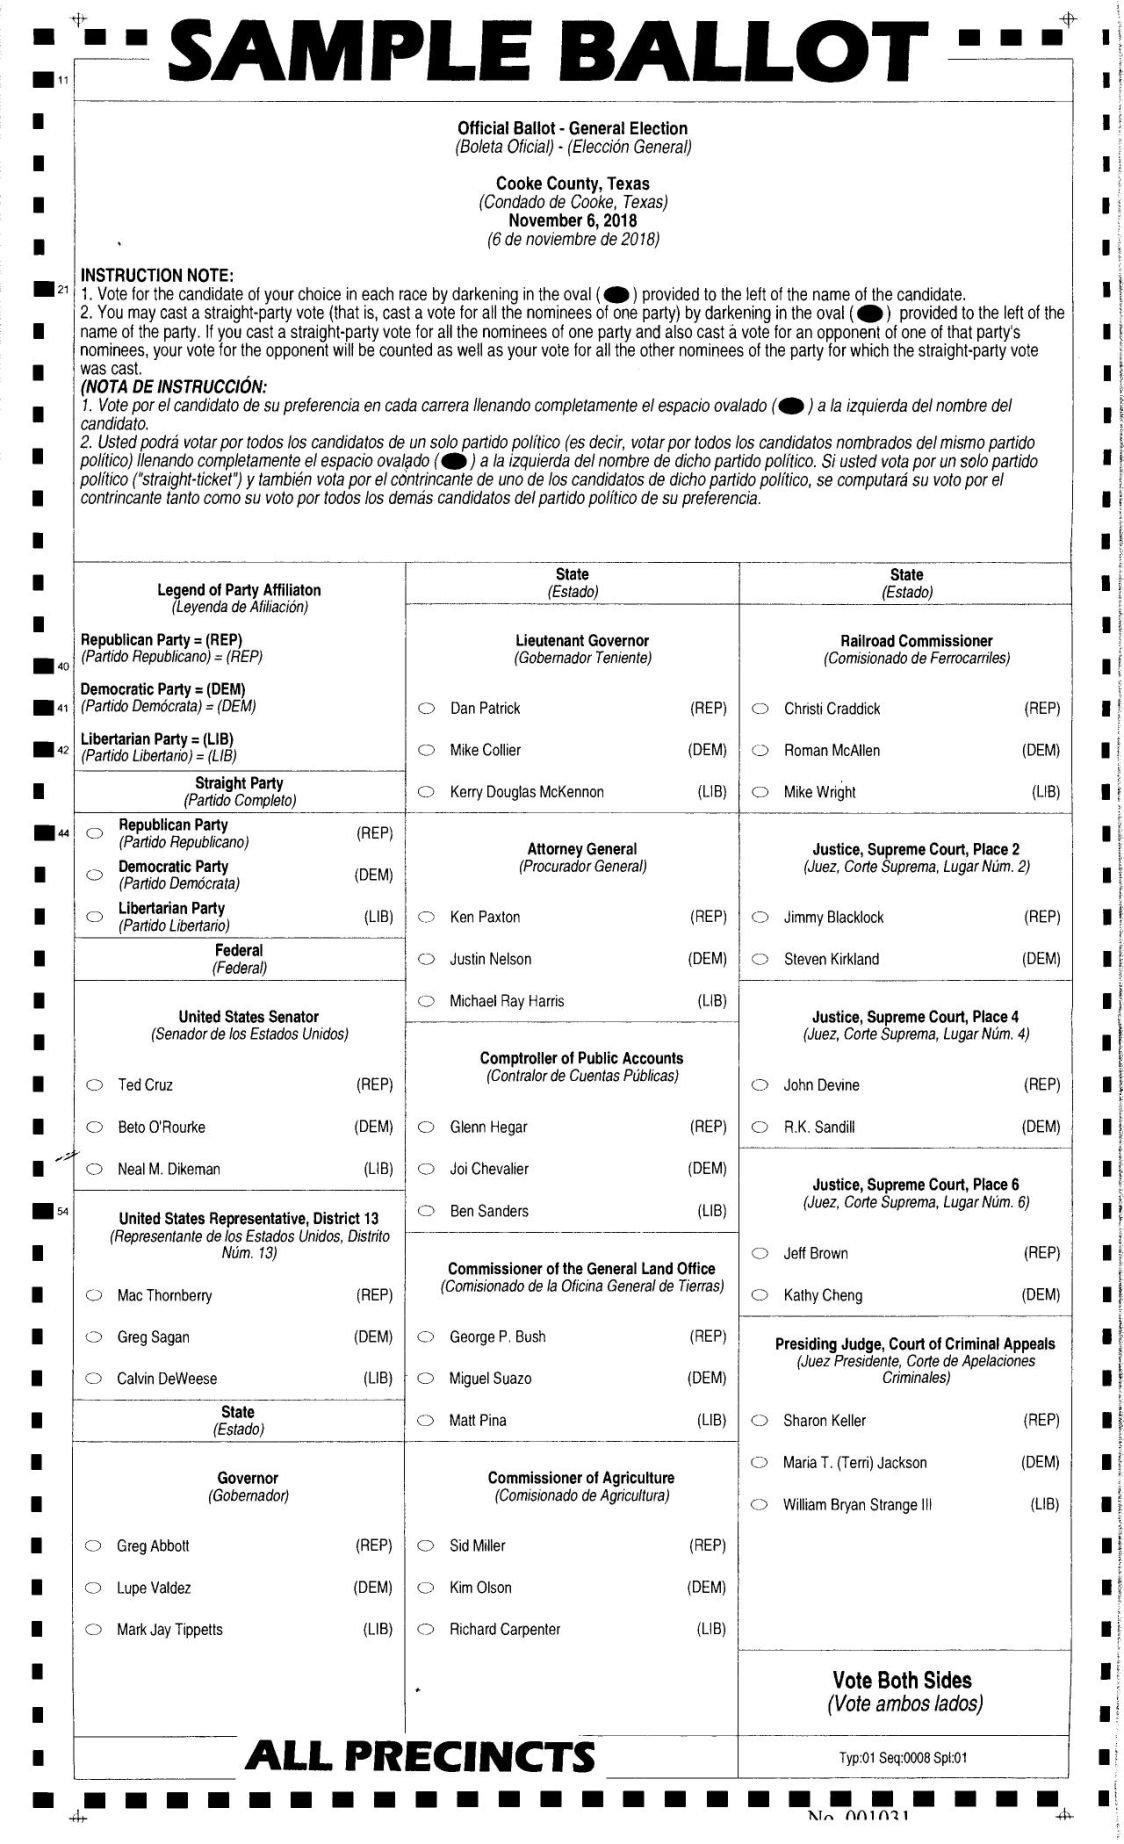 sample ballot for 2018 general election